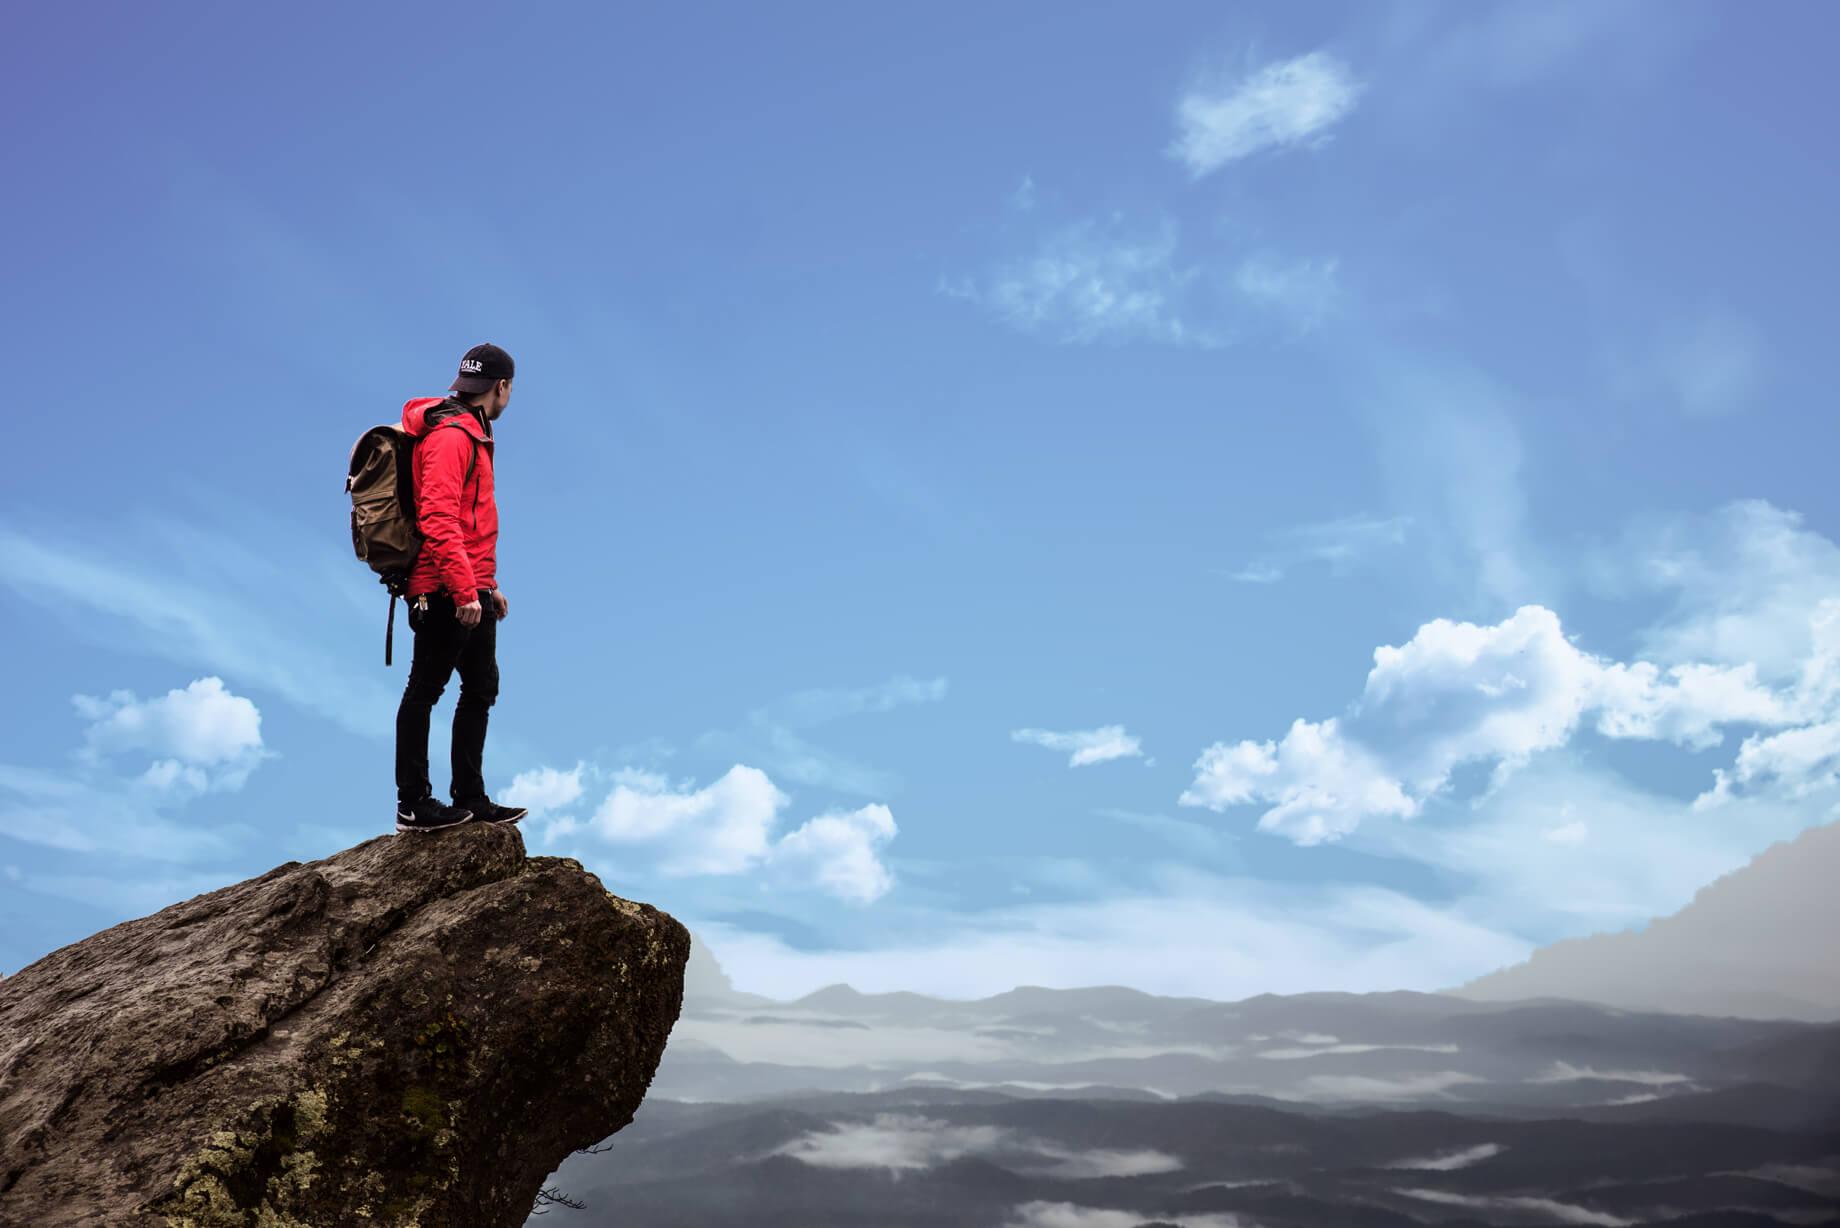 Vorarlberg: Gründer auf hohem Niveau